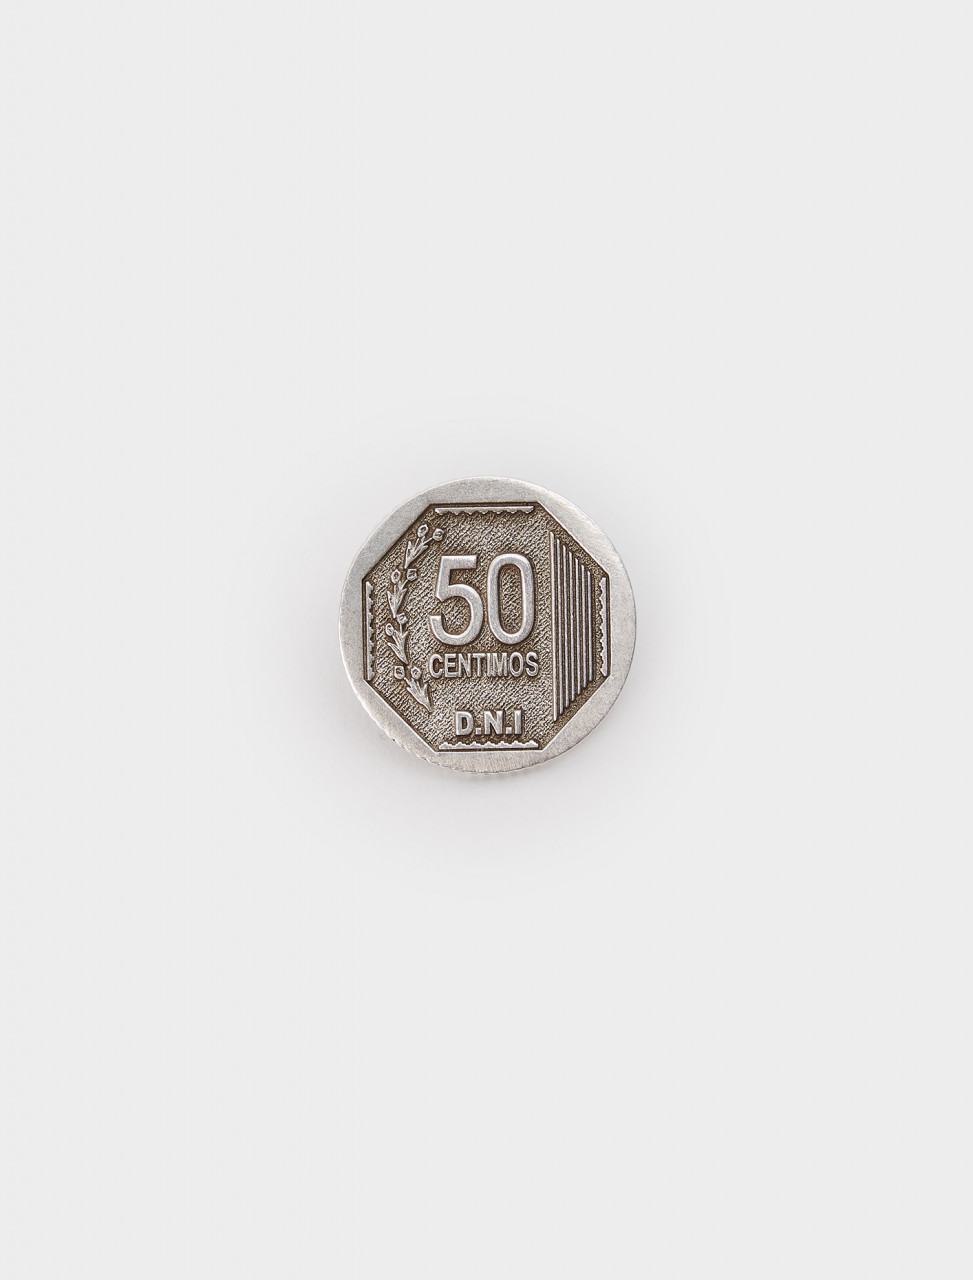 354-J01INT D.N.I 50 CENTIMOS MONO EARRING SILVER